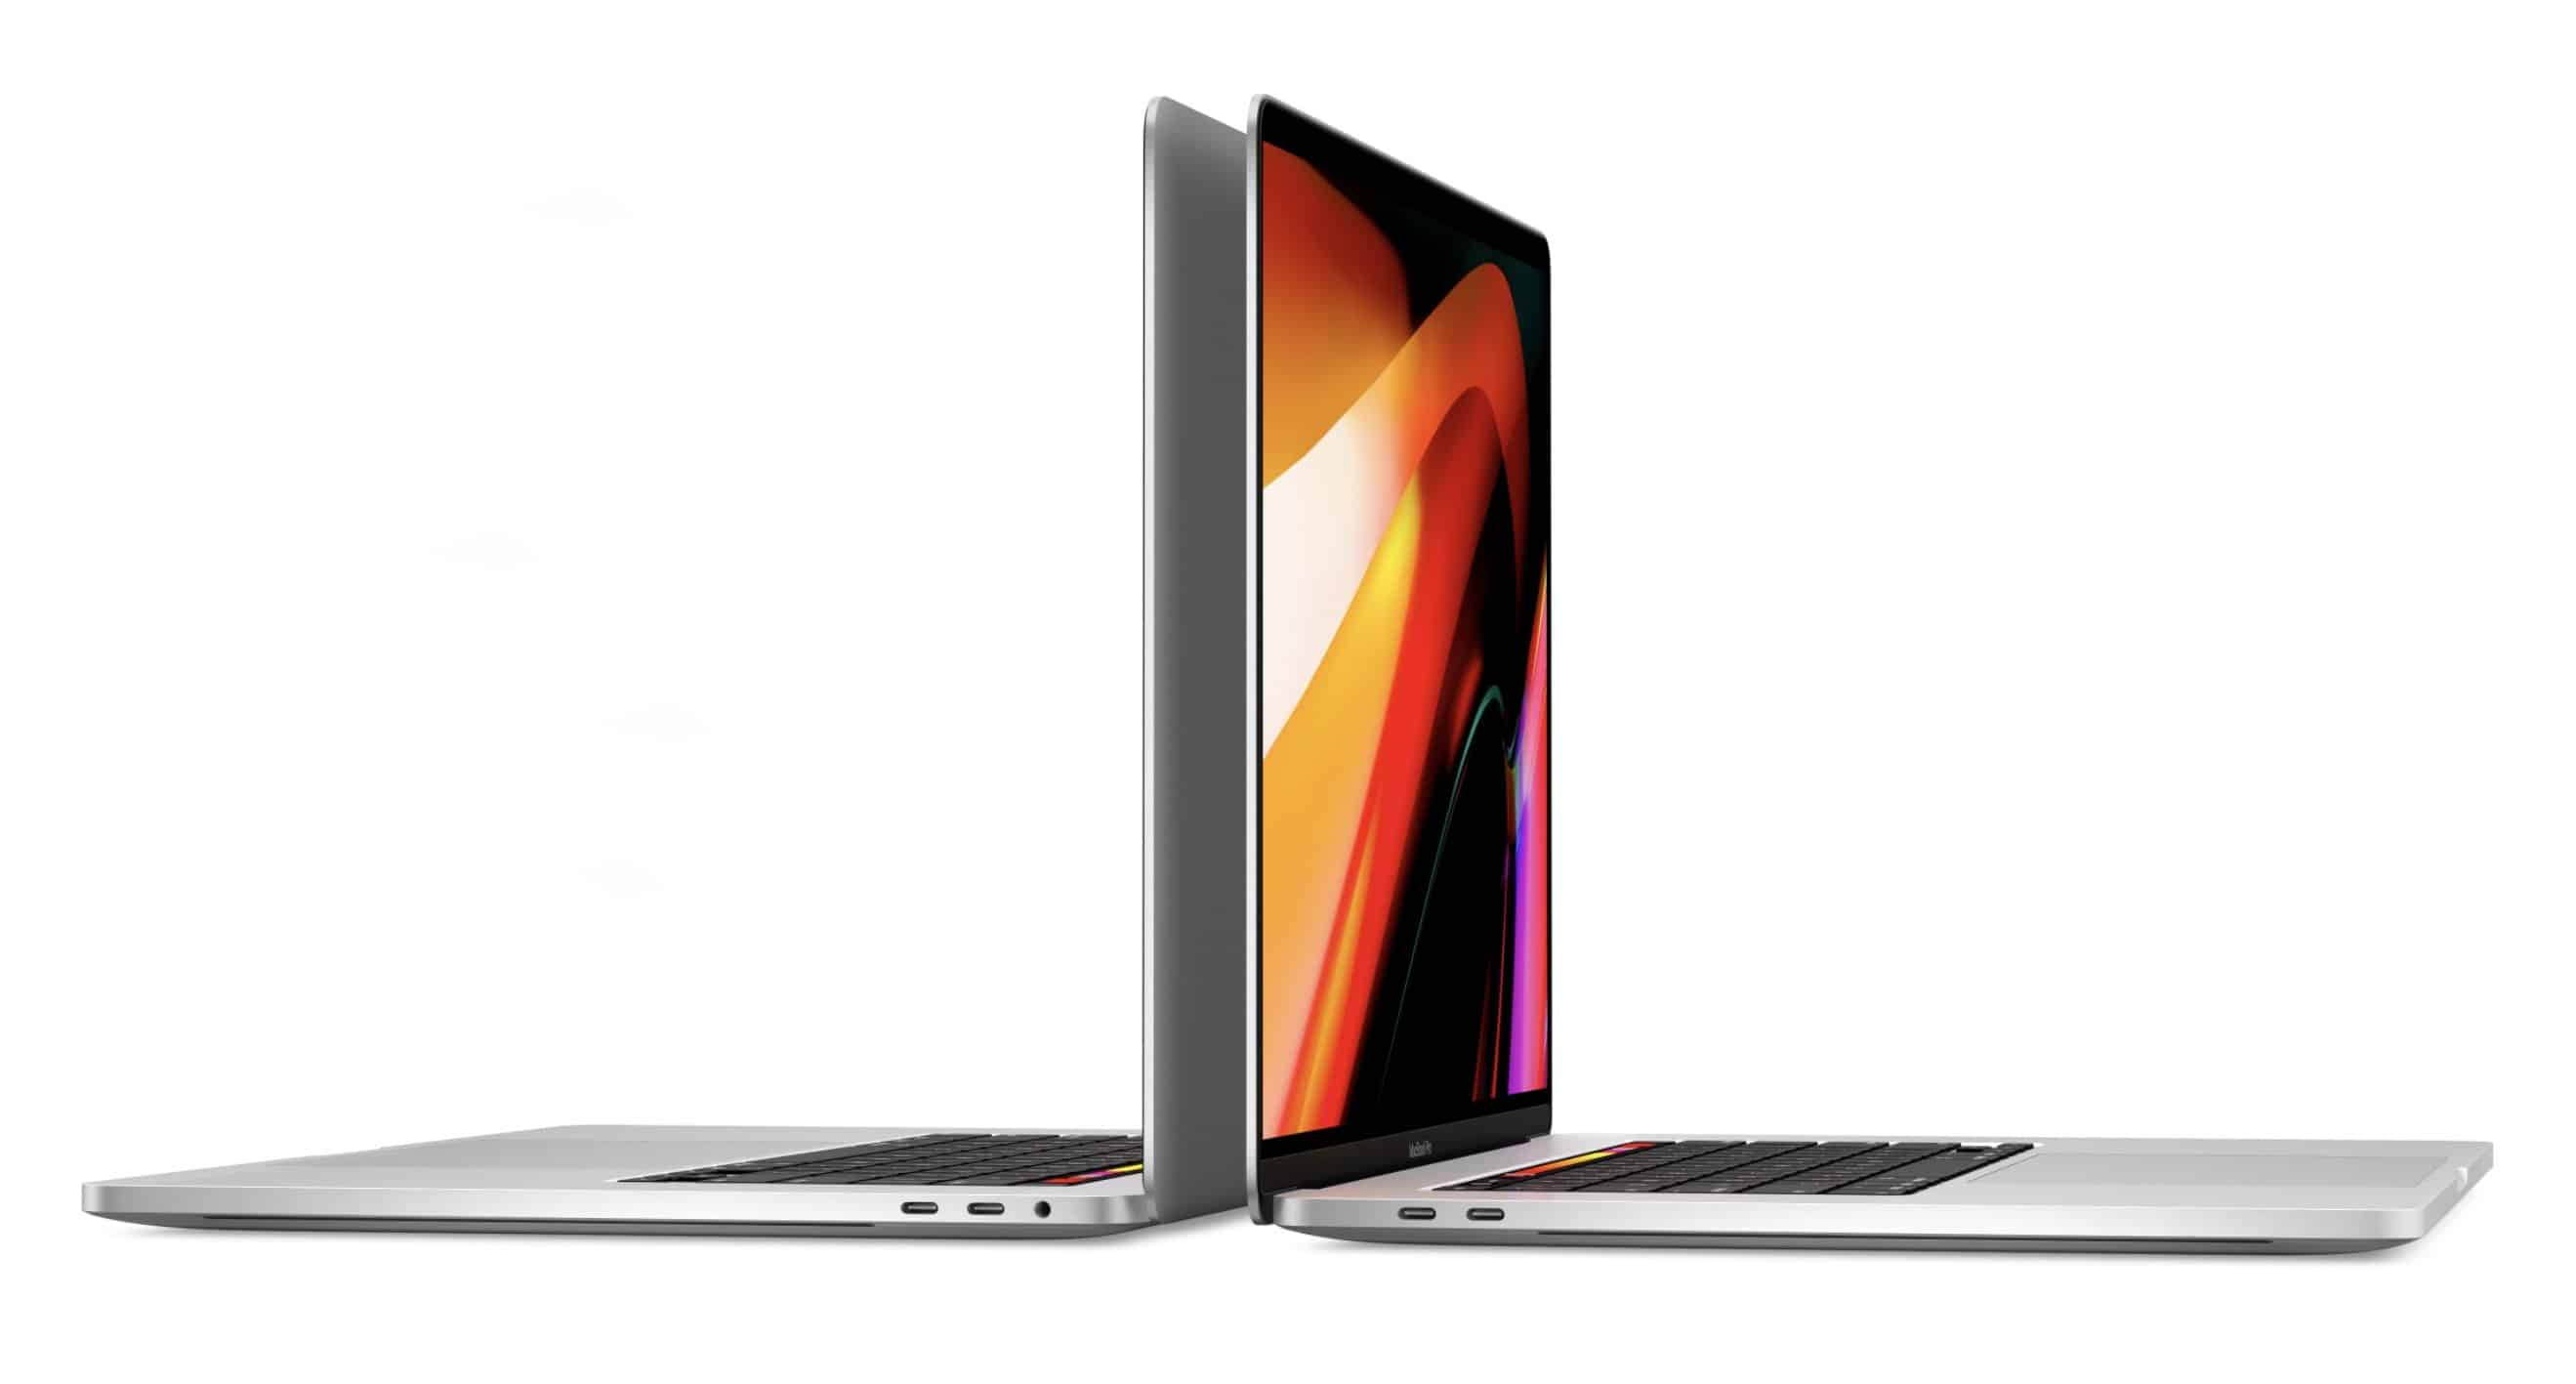 MacBook Pro 16 inch - Thật Đẹp